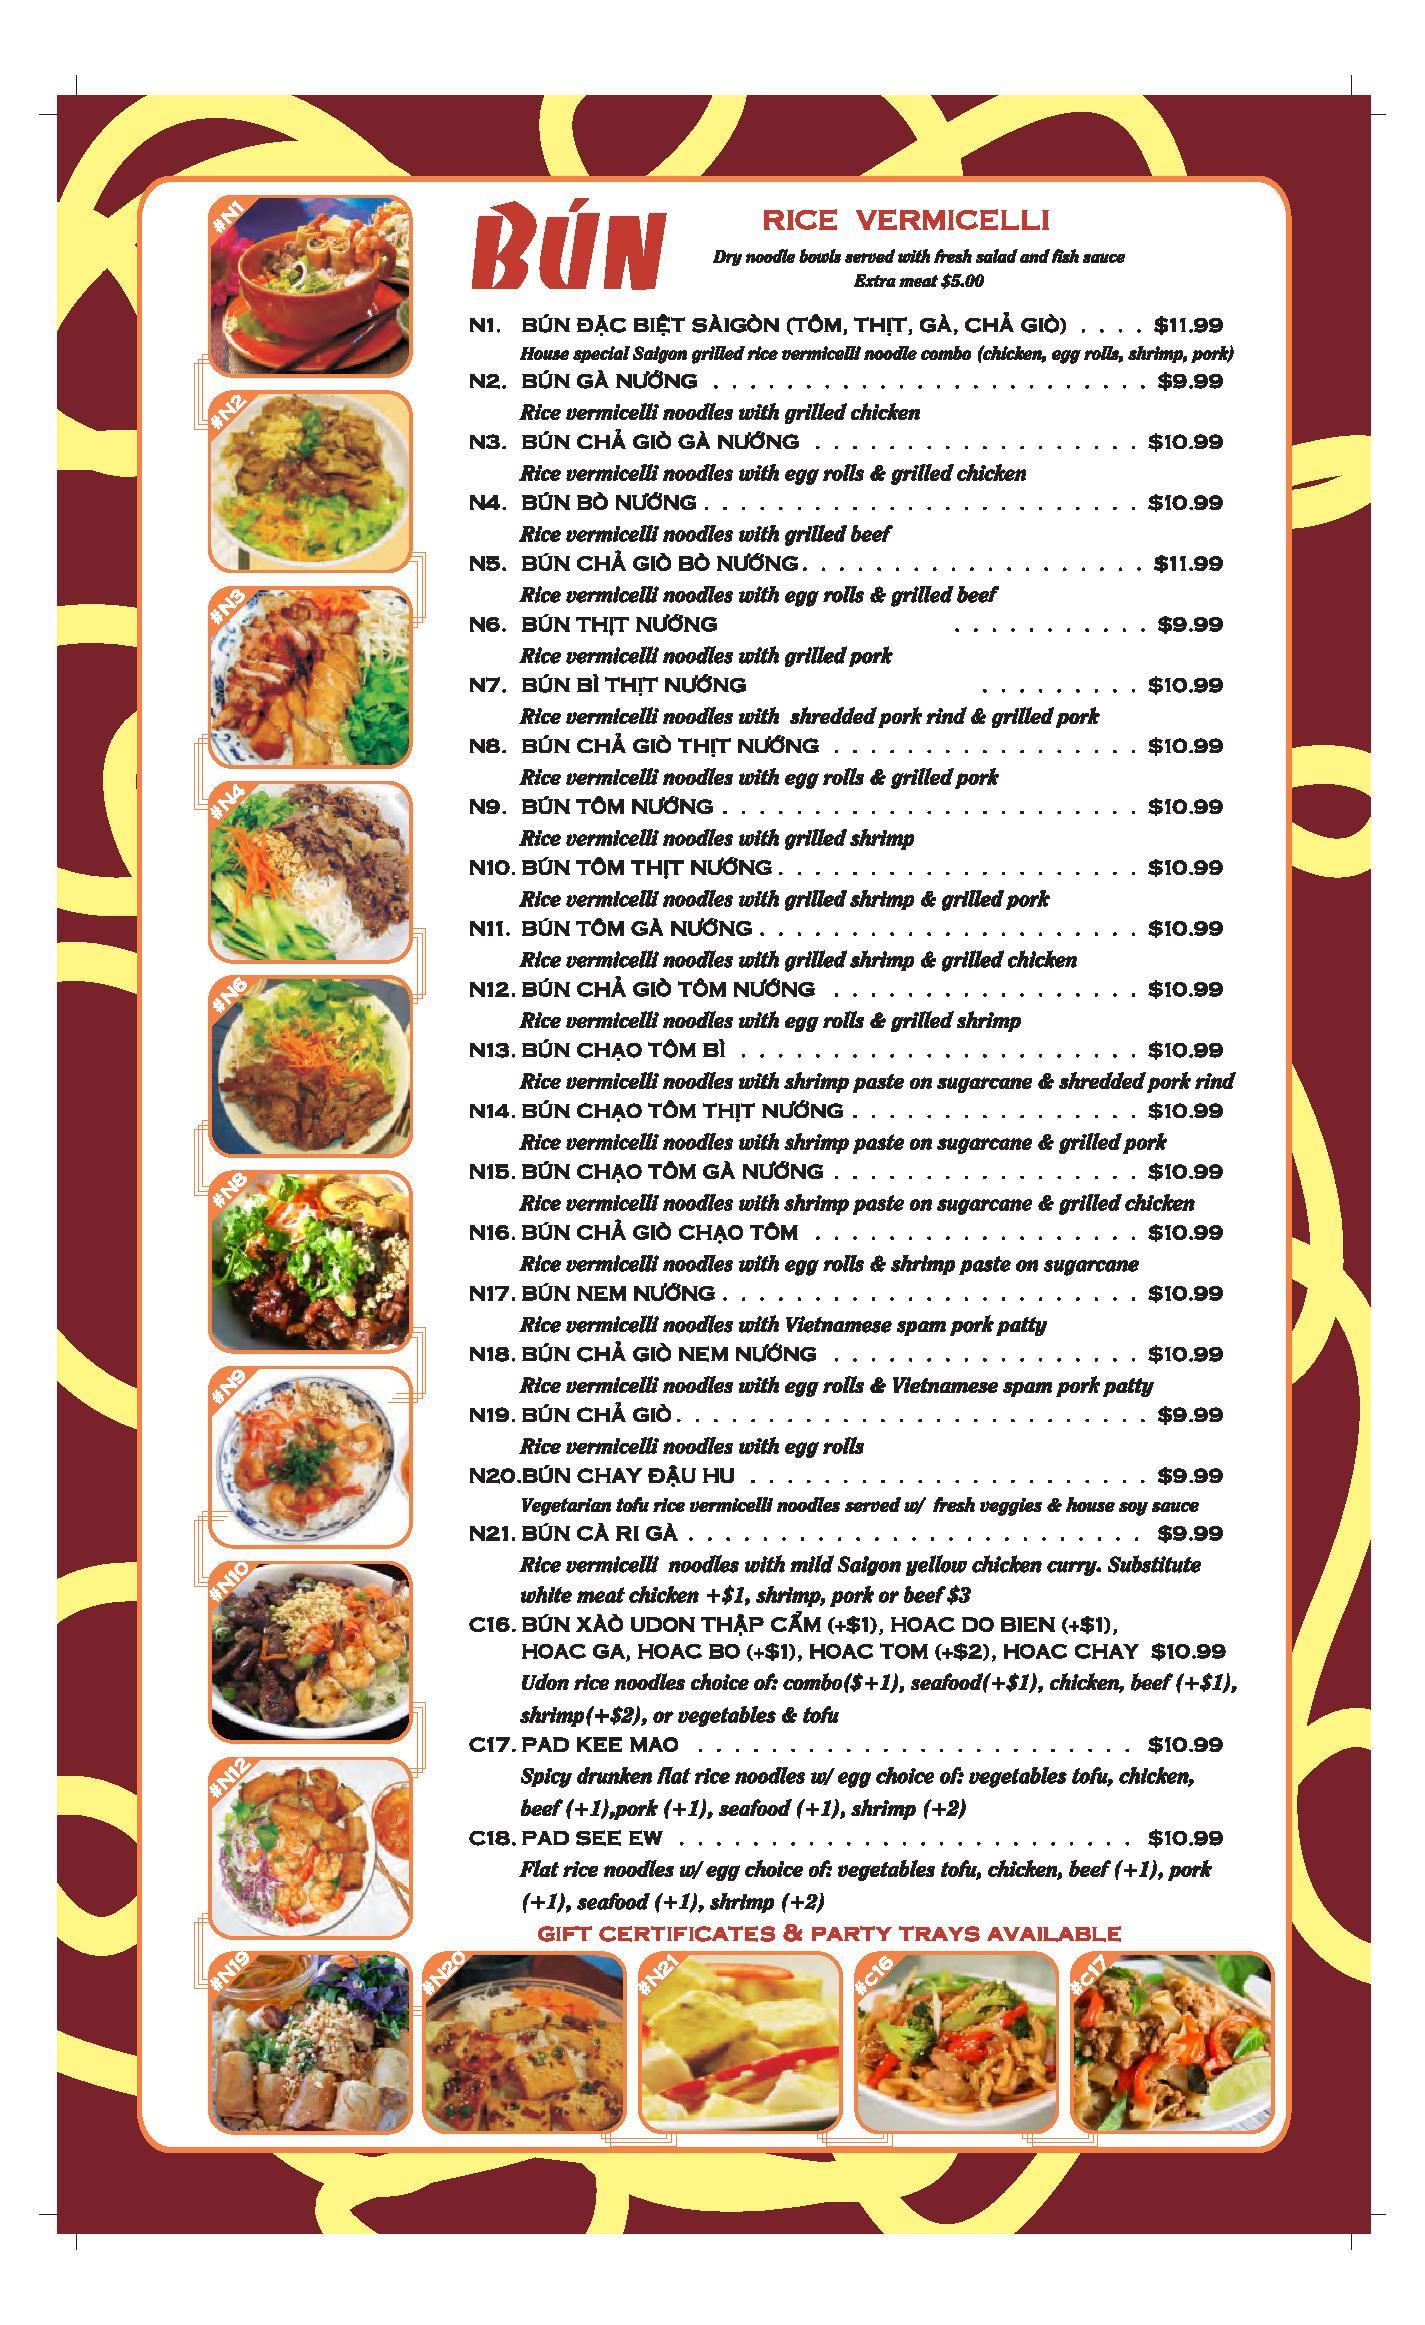 State Of the Art Cuisine Express Image Samples - Jobzz4u.us : Jobzz4u.us